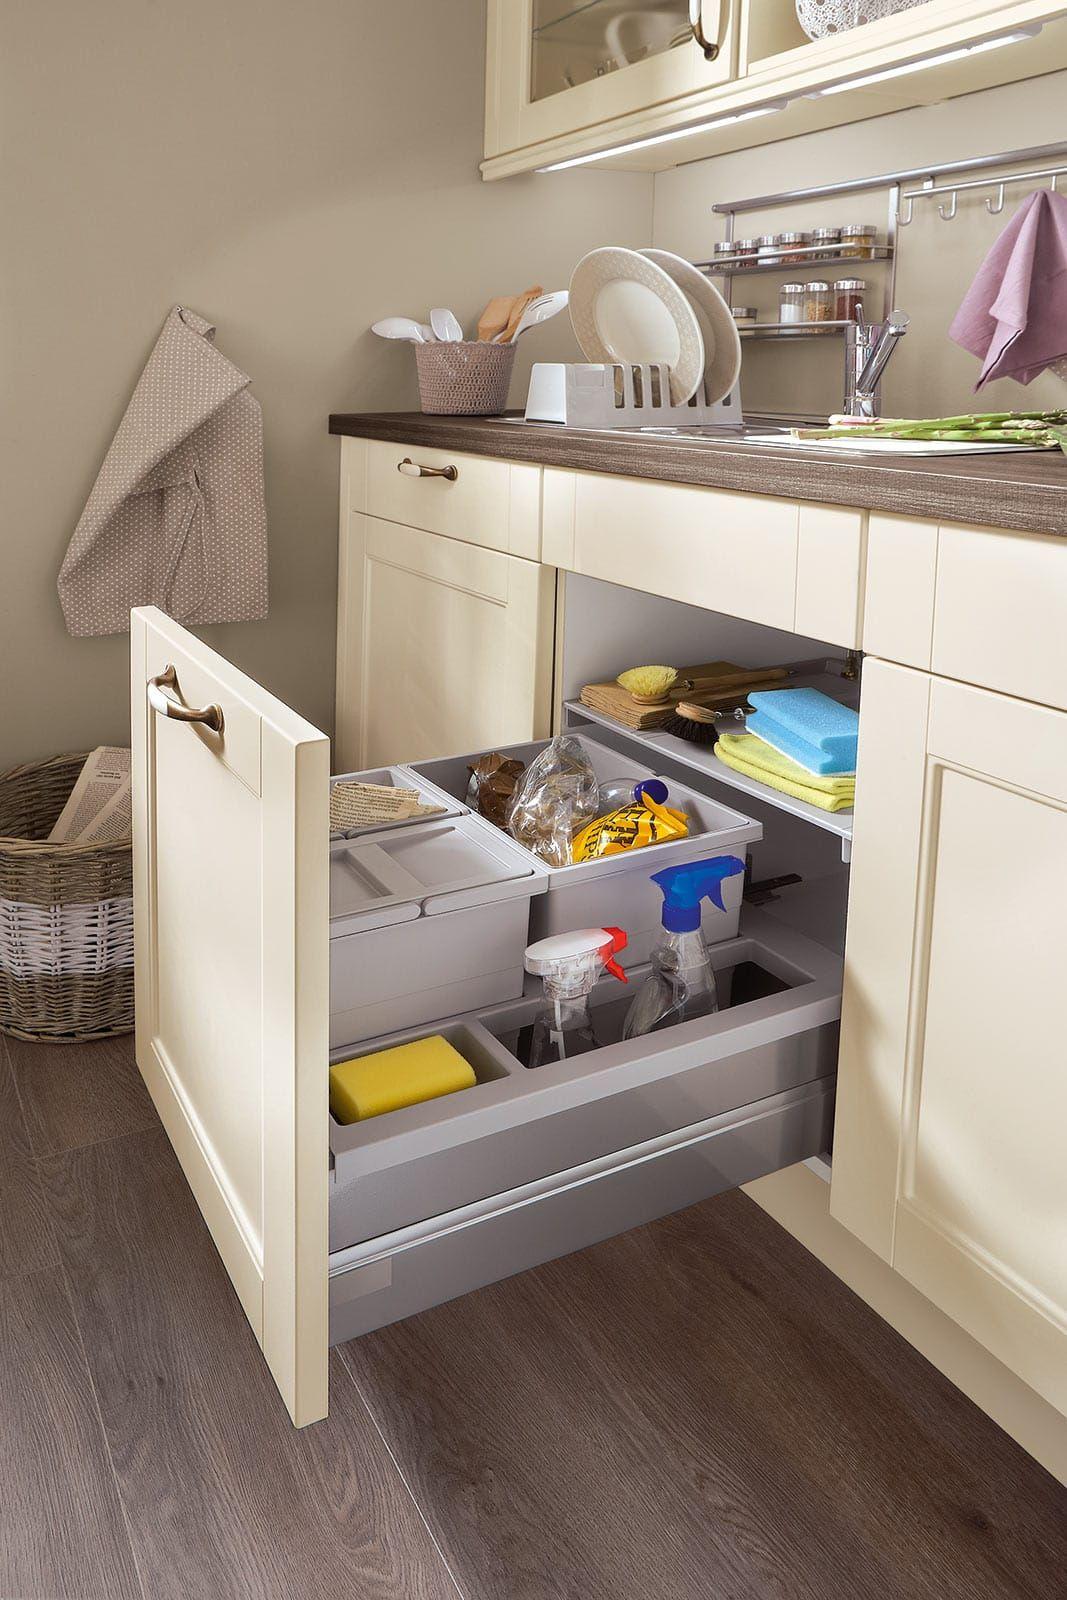 Abfallsystem Einbauküche Creme Norina 7365